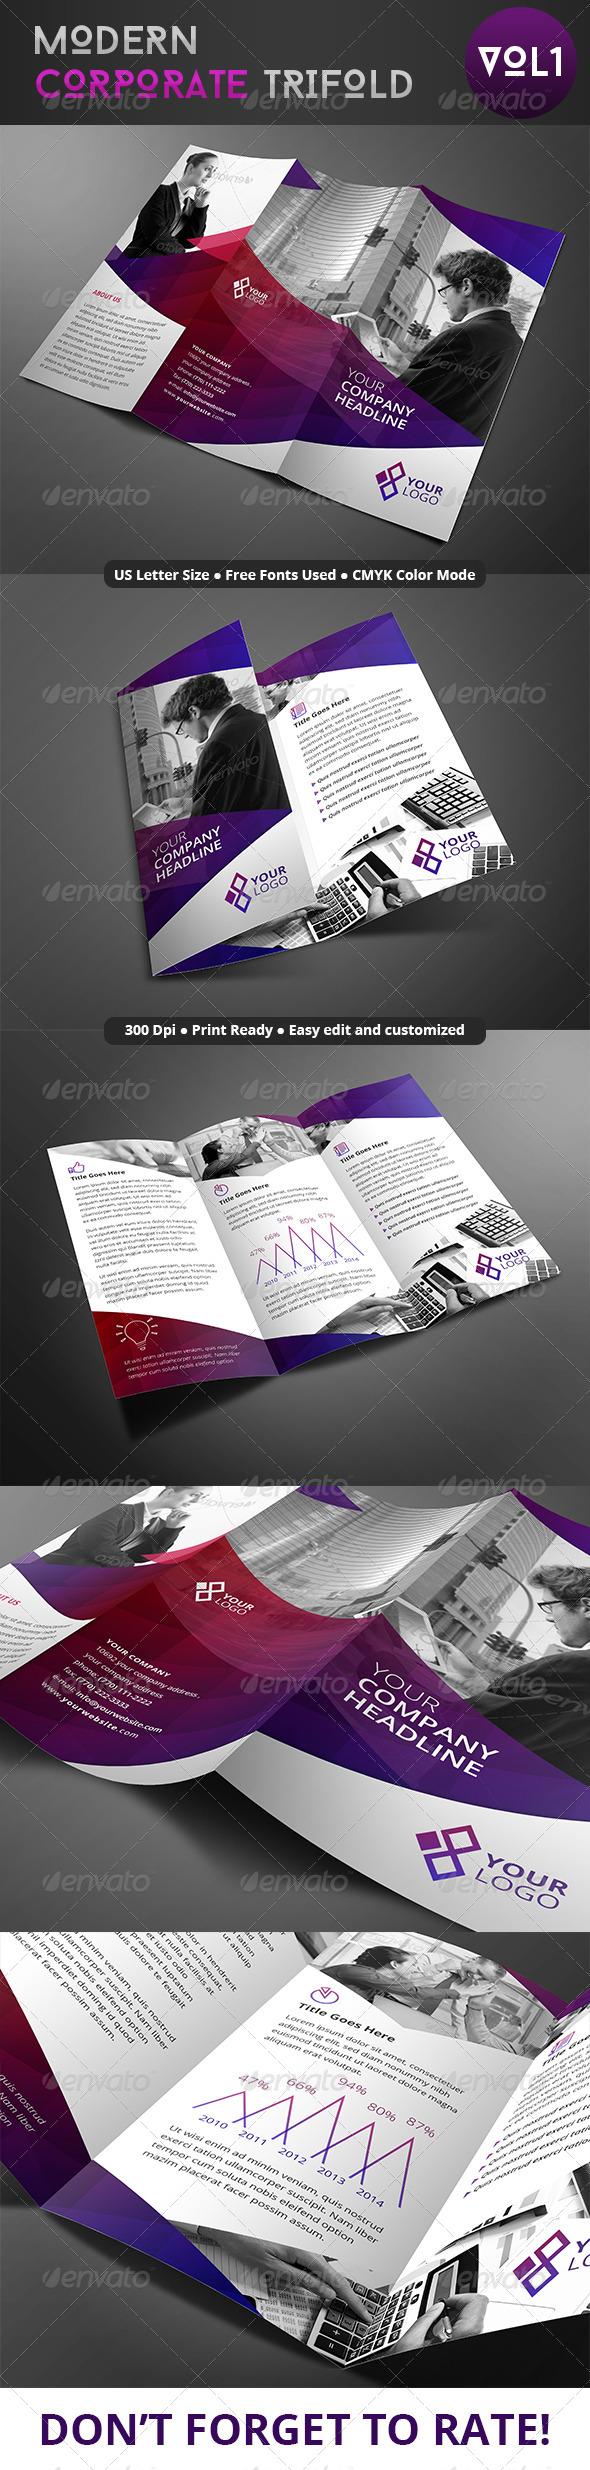 GraphicRiver Modern Corporate Trifold 8064902